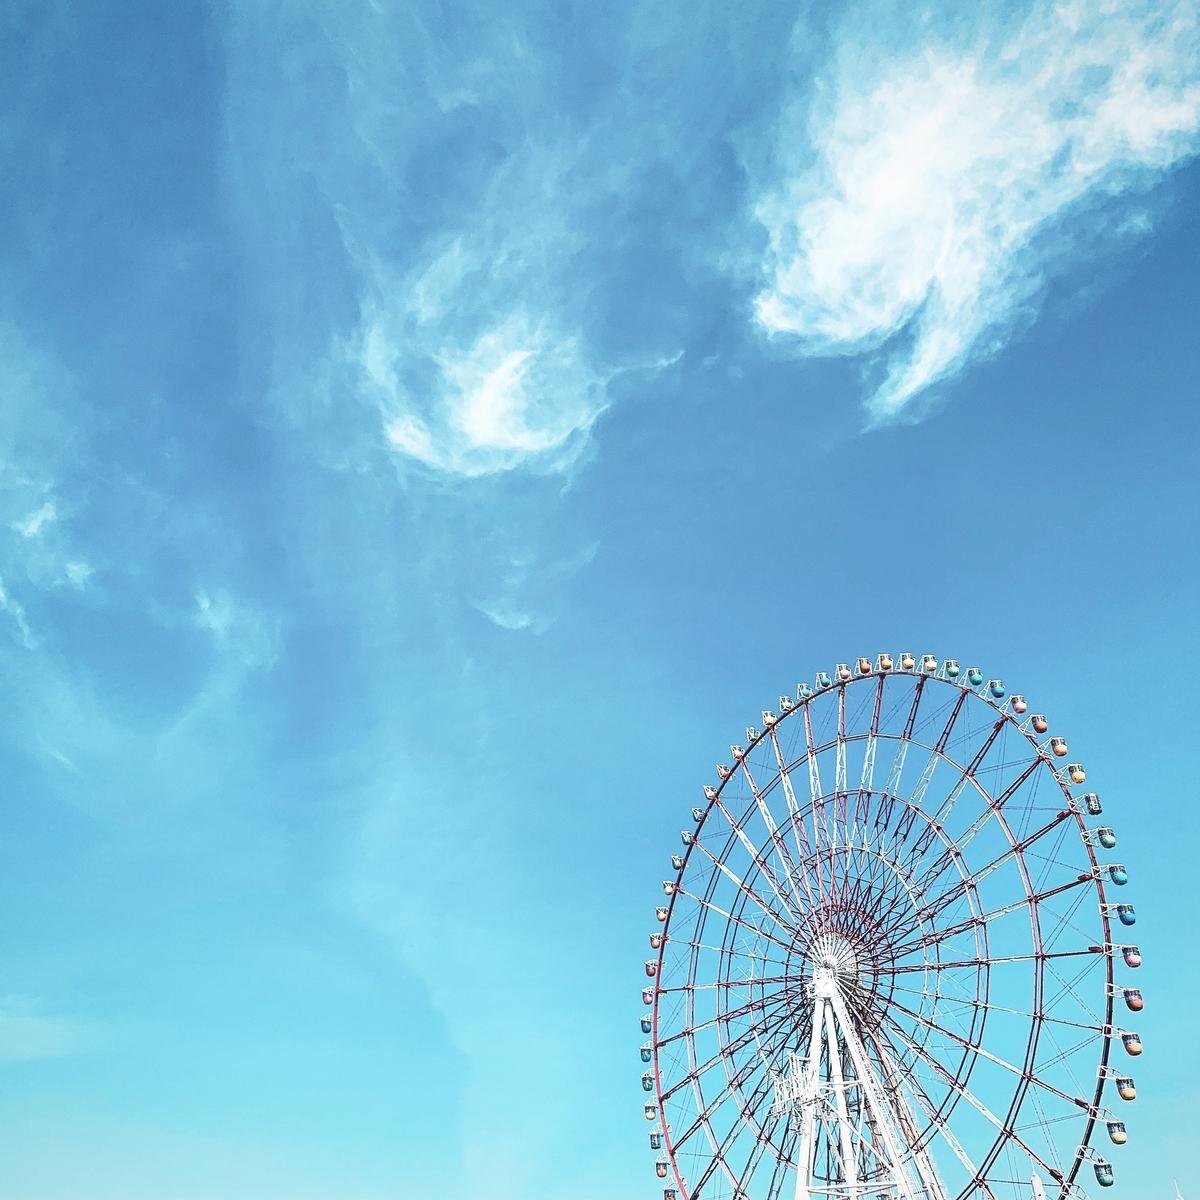 f:id:satoru-itabashi:20190531085609j:plain